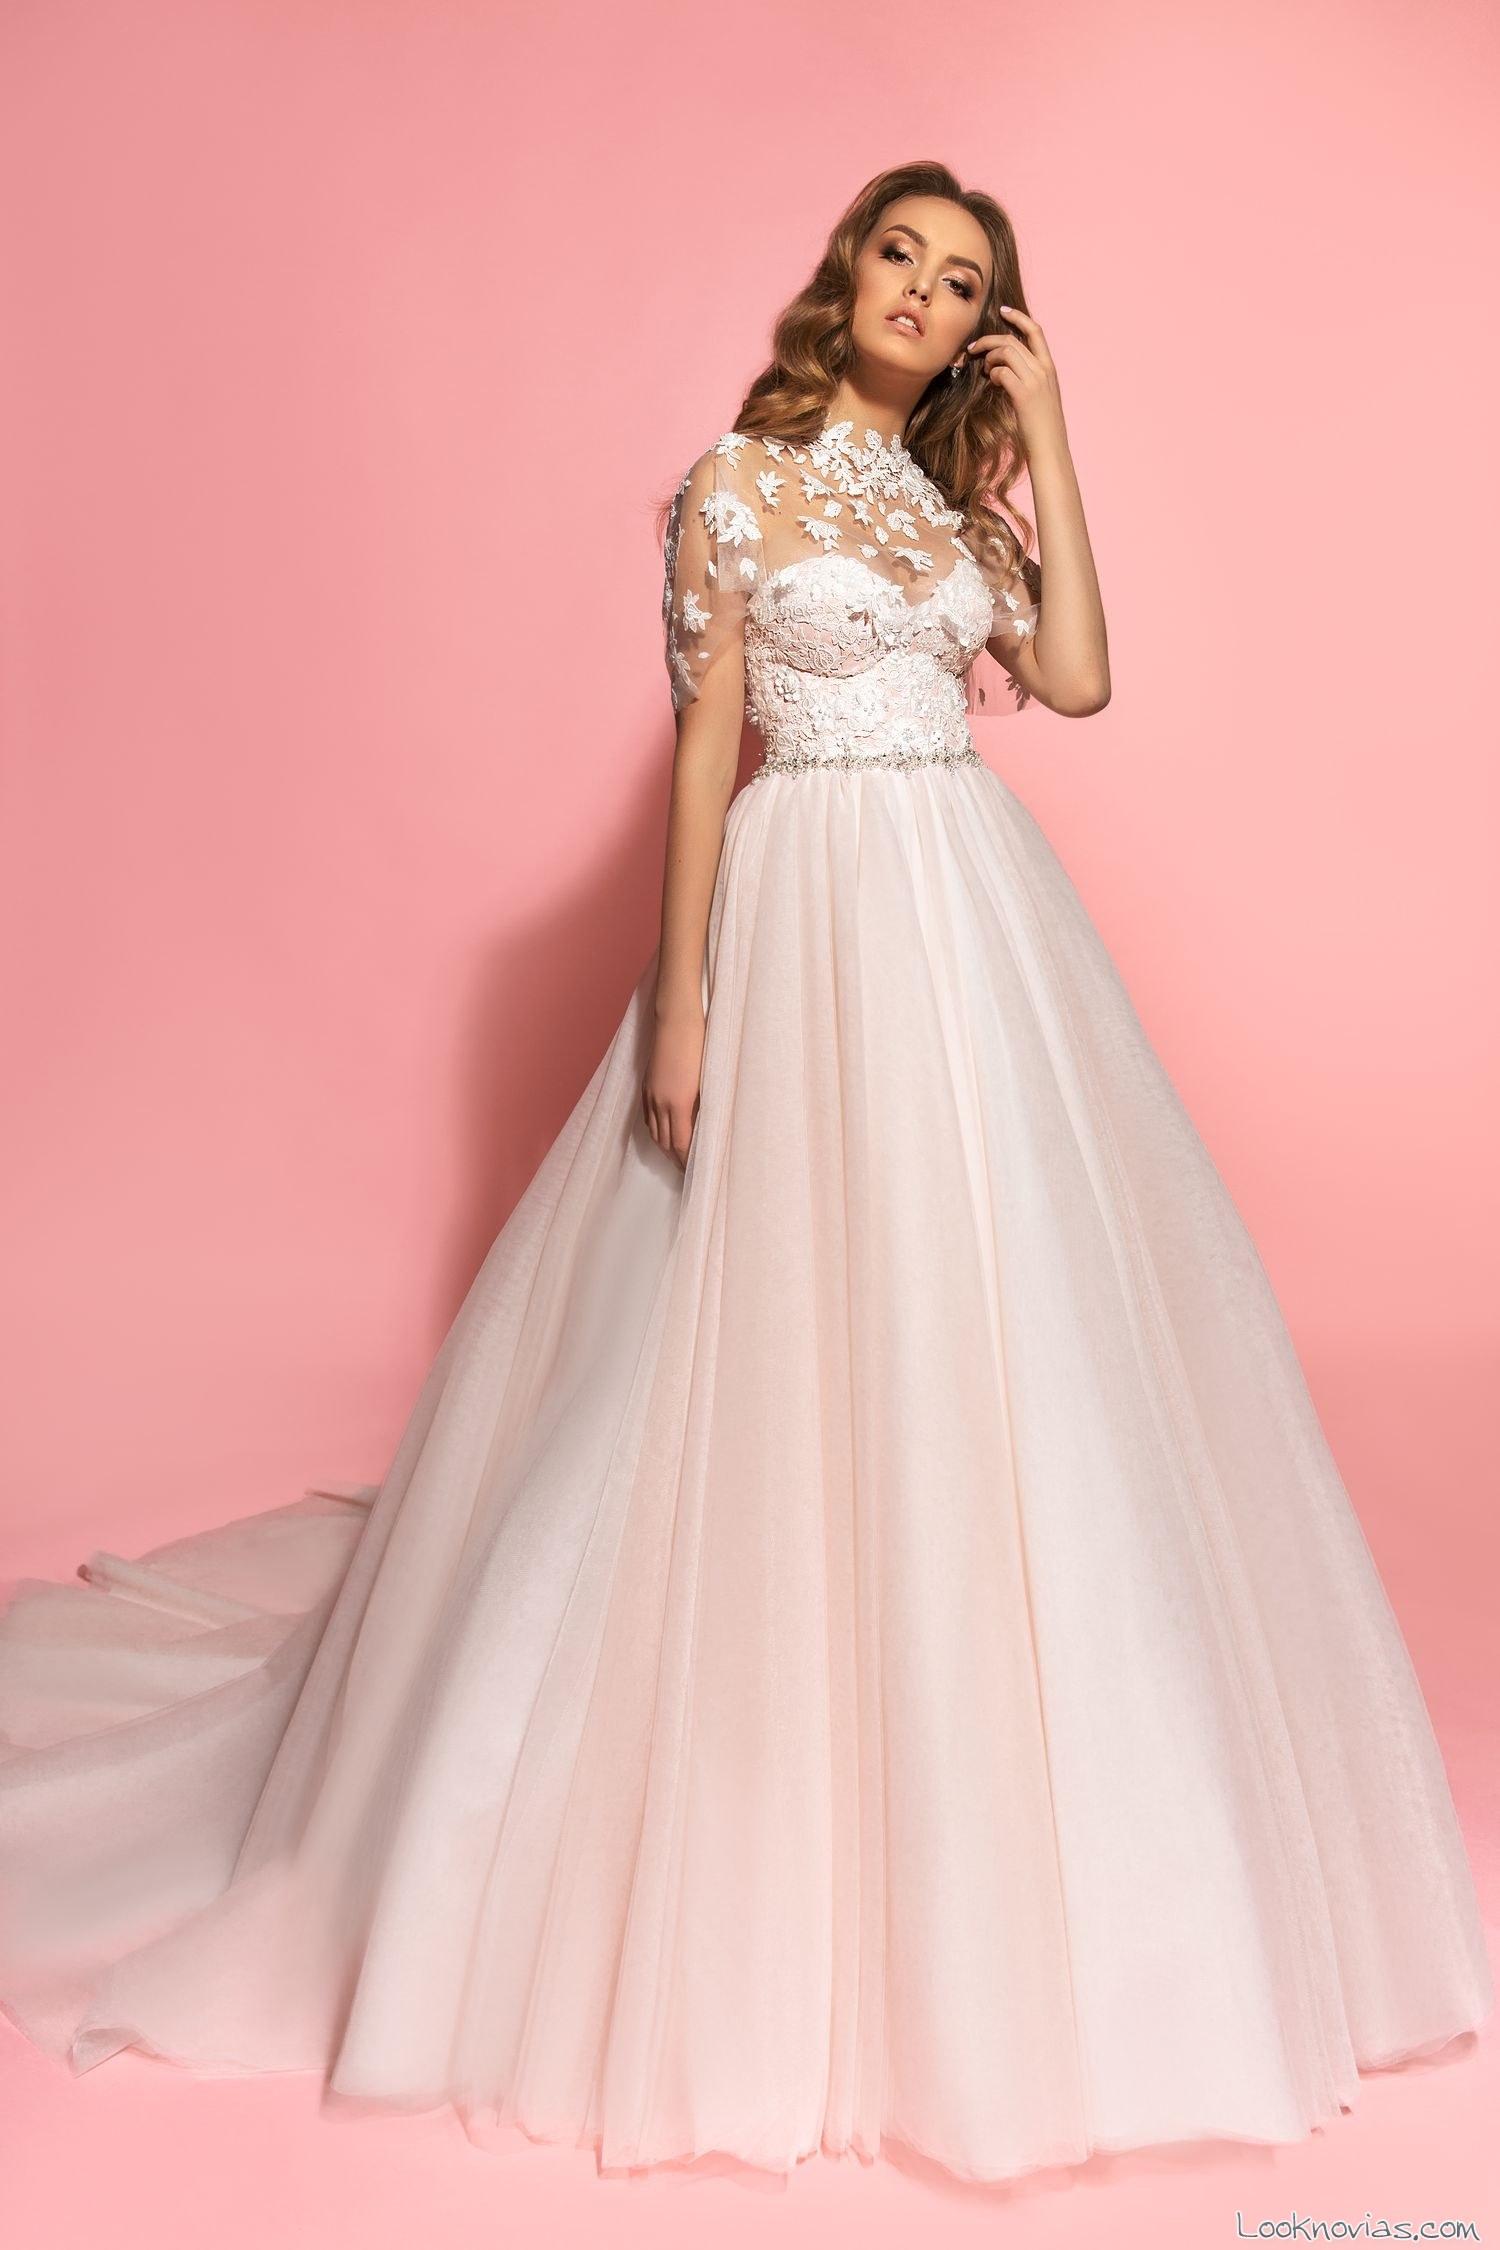 vestido princesa eva lendel